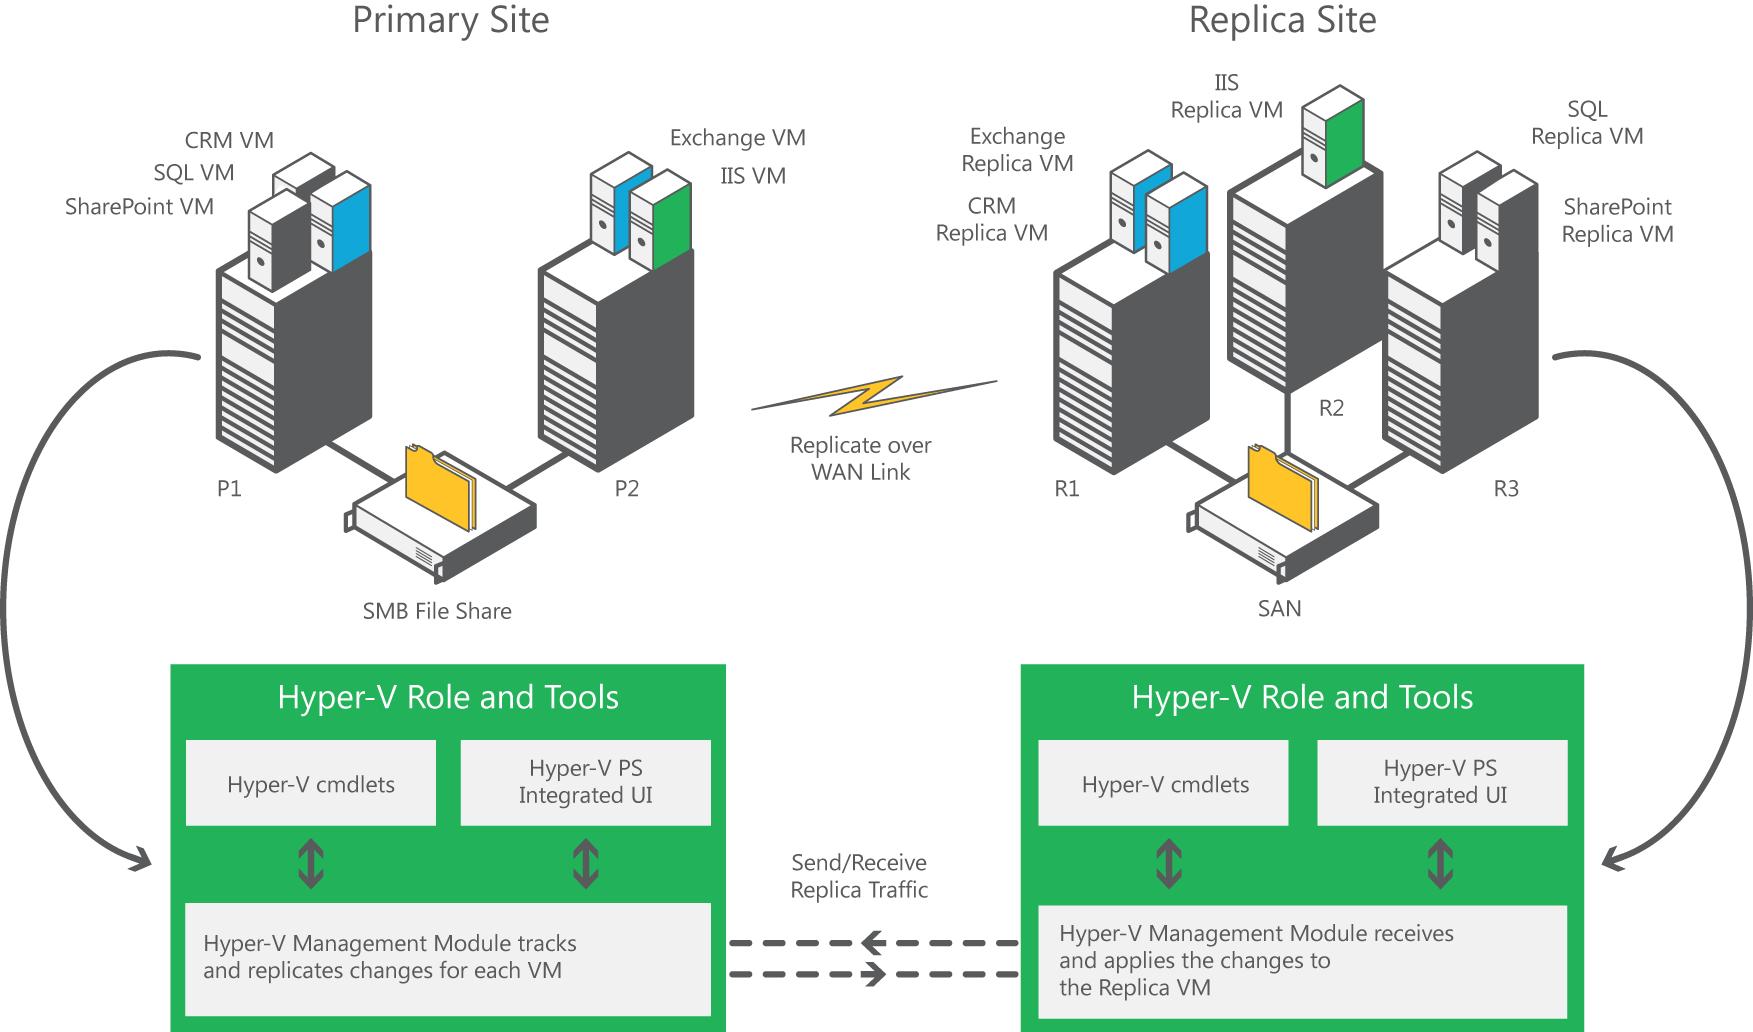 hyper v replica getvirtual virtualization 4 all rh mdnoga wordpress com Hyper-V 2012 Cluster Hyper-V Cluster Arch